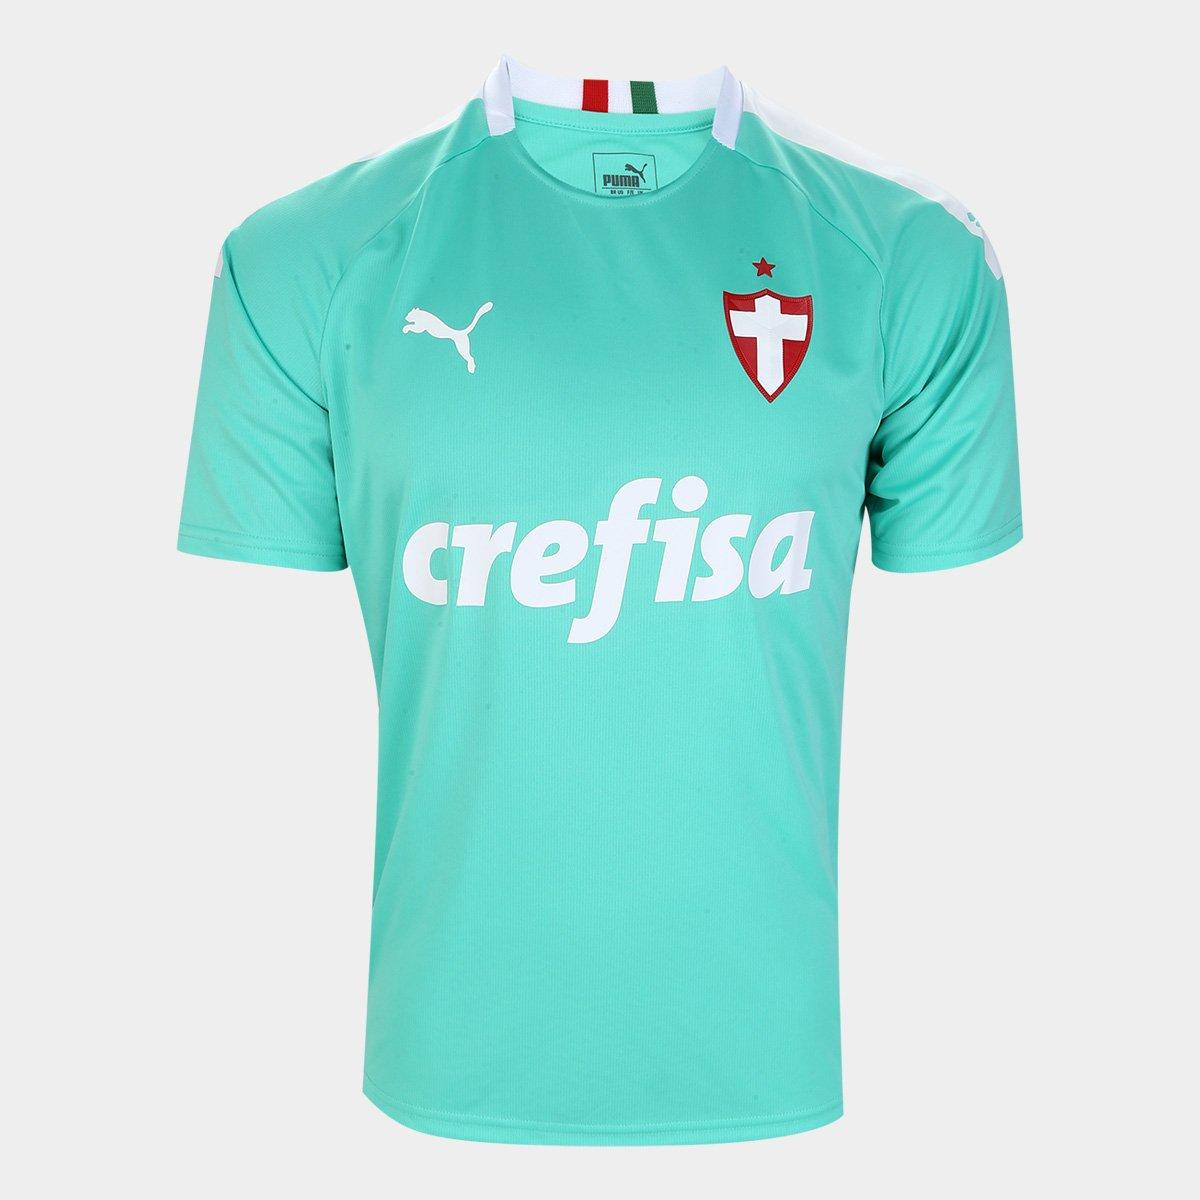 Camisa Palmeiras III 19/20 s/n° - Torcedor Puma Masculina - Tam: G